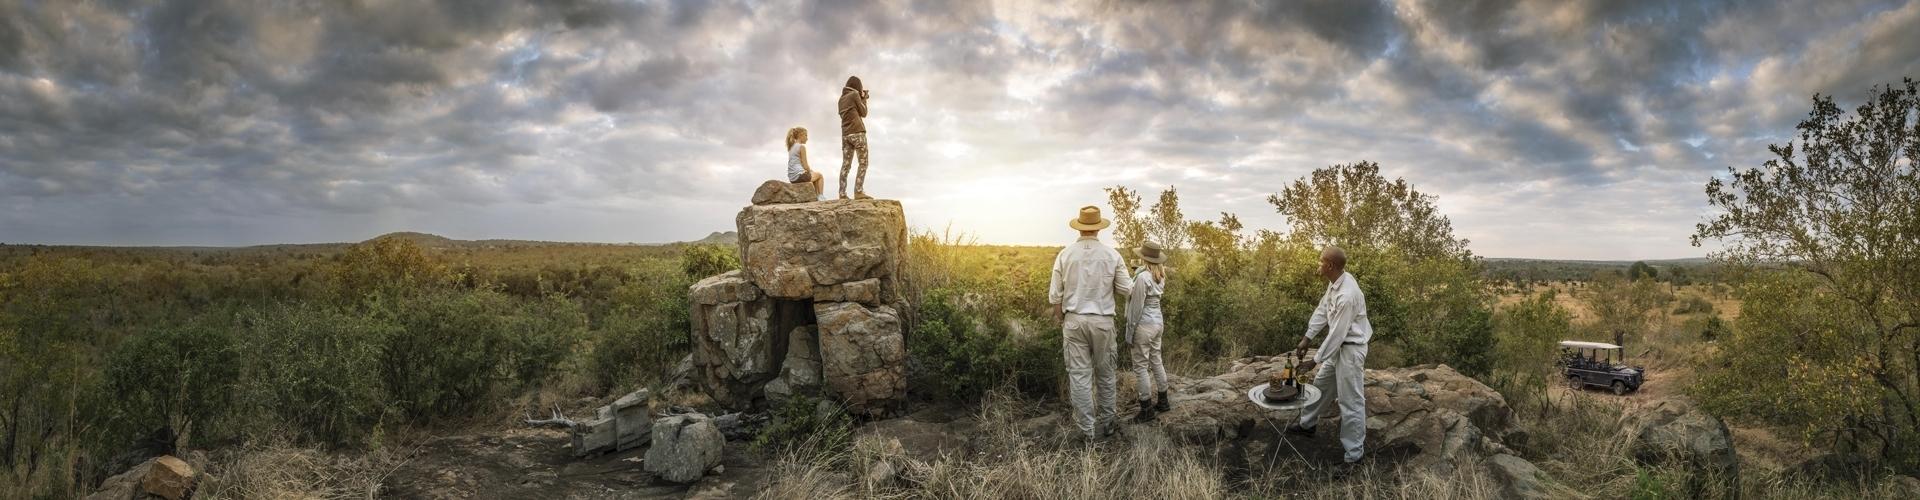 Kruger National Park - Luxe Safari Zuid-Afrika